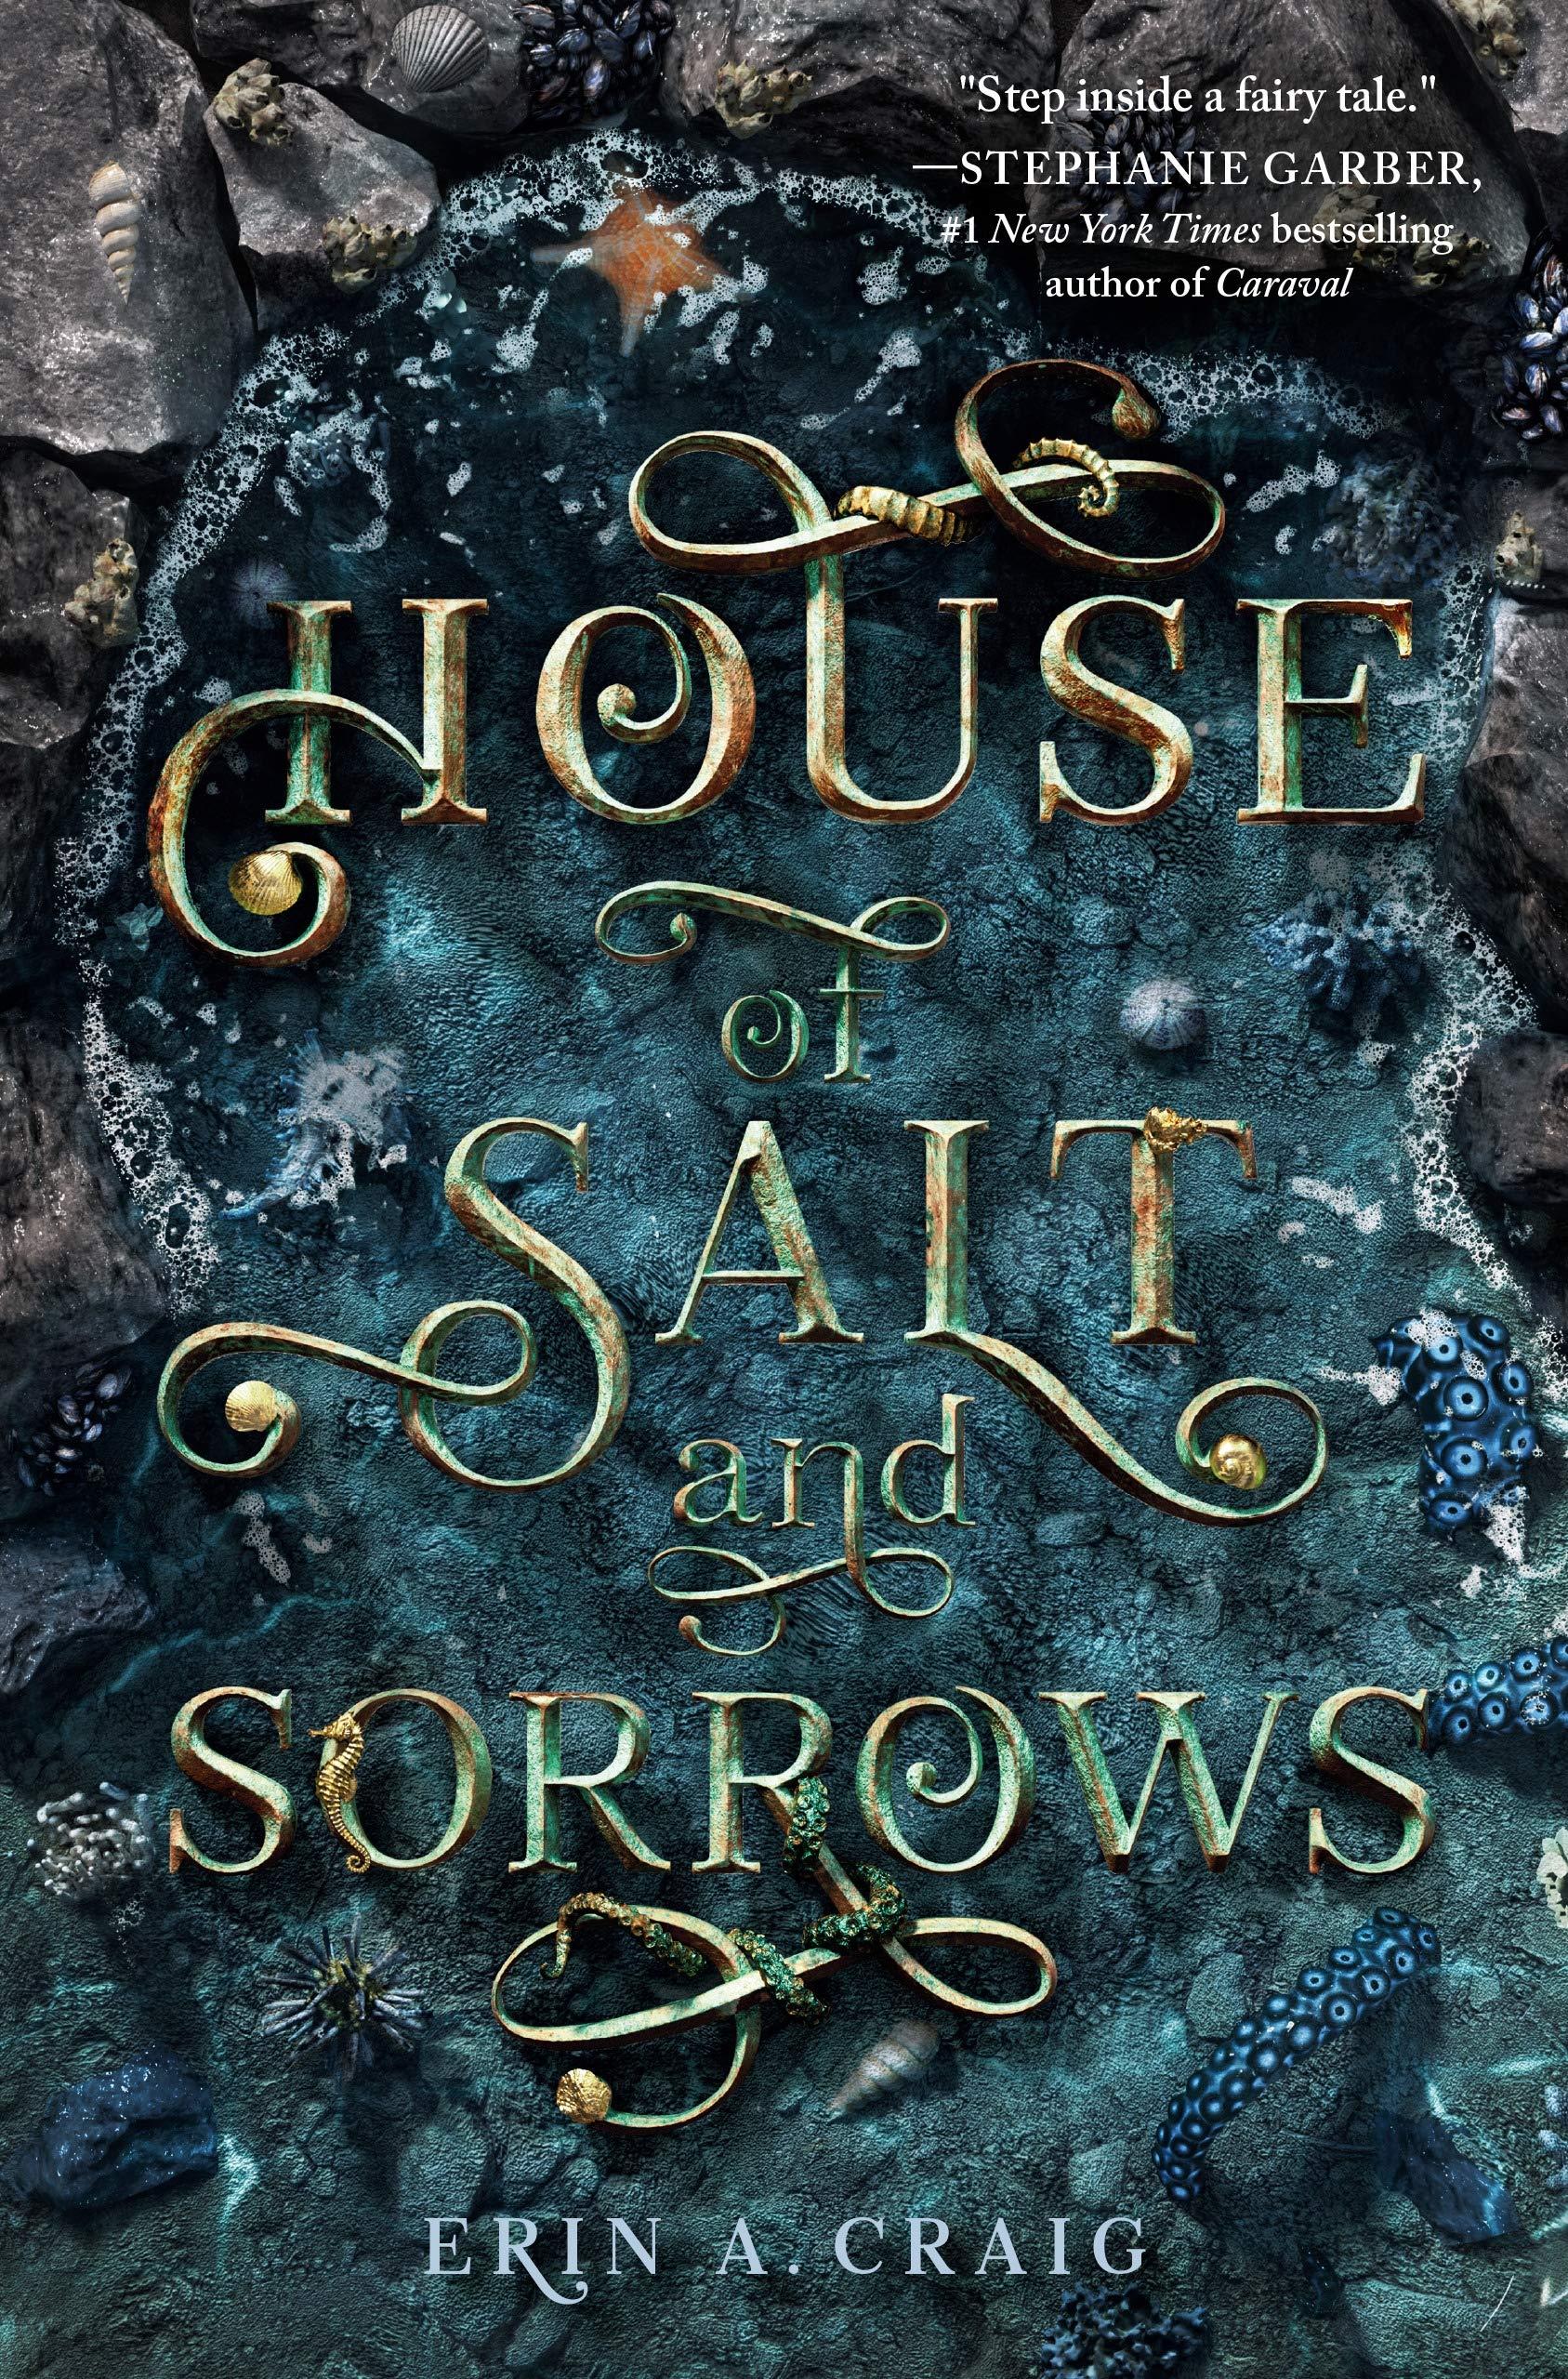 The House of Salt and Sorrows  spooky season books for kids _ Bored Teachers